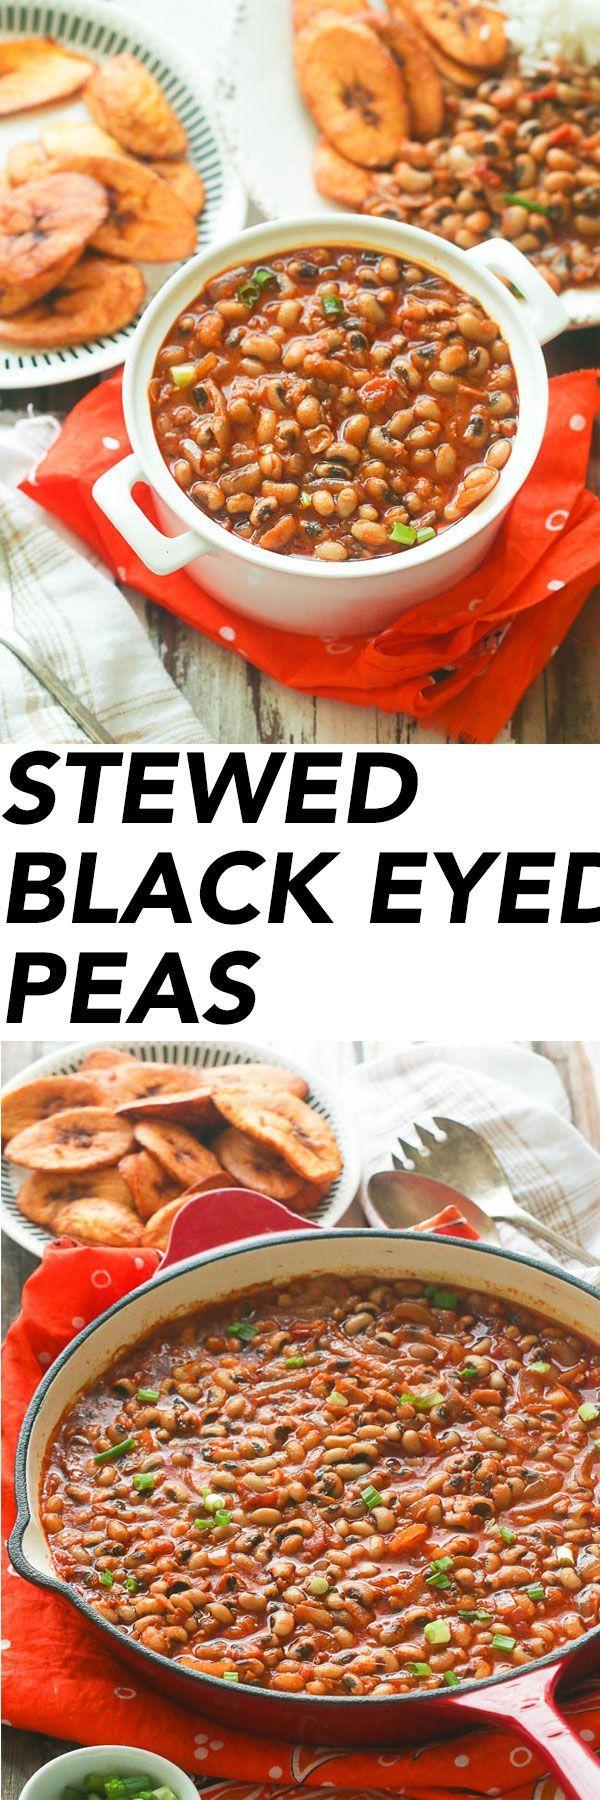 Stewed Blacked Eyed Peas | Immaculate Bites